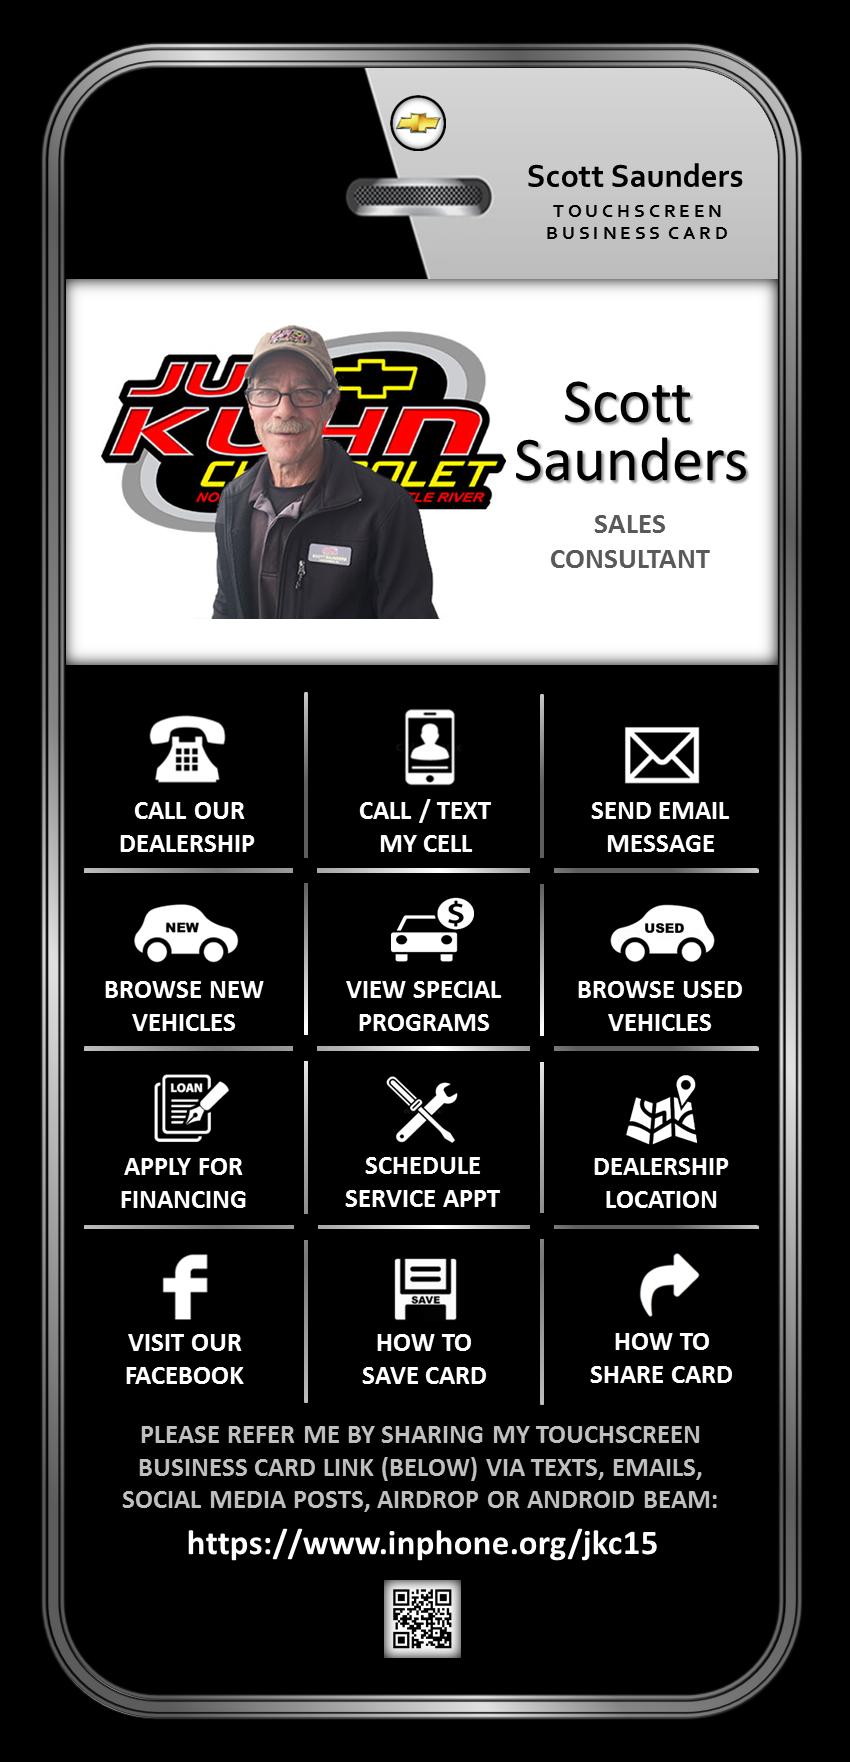 jud kuhn1 - Scott Saunders.png